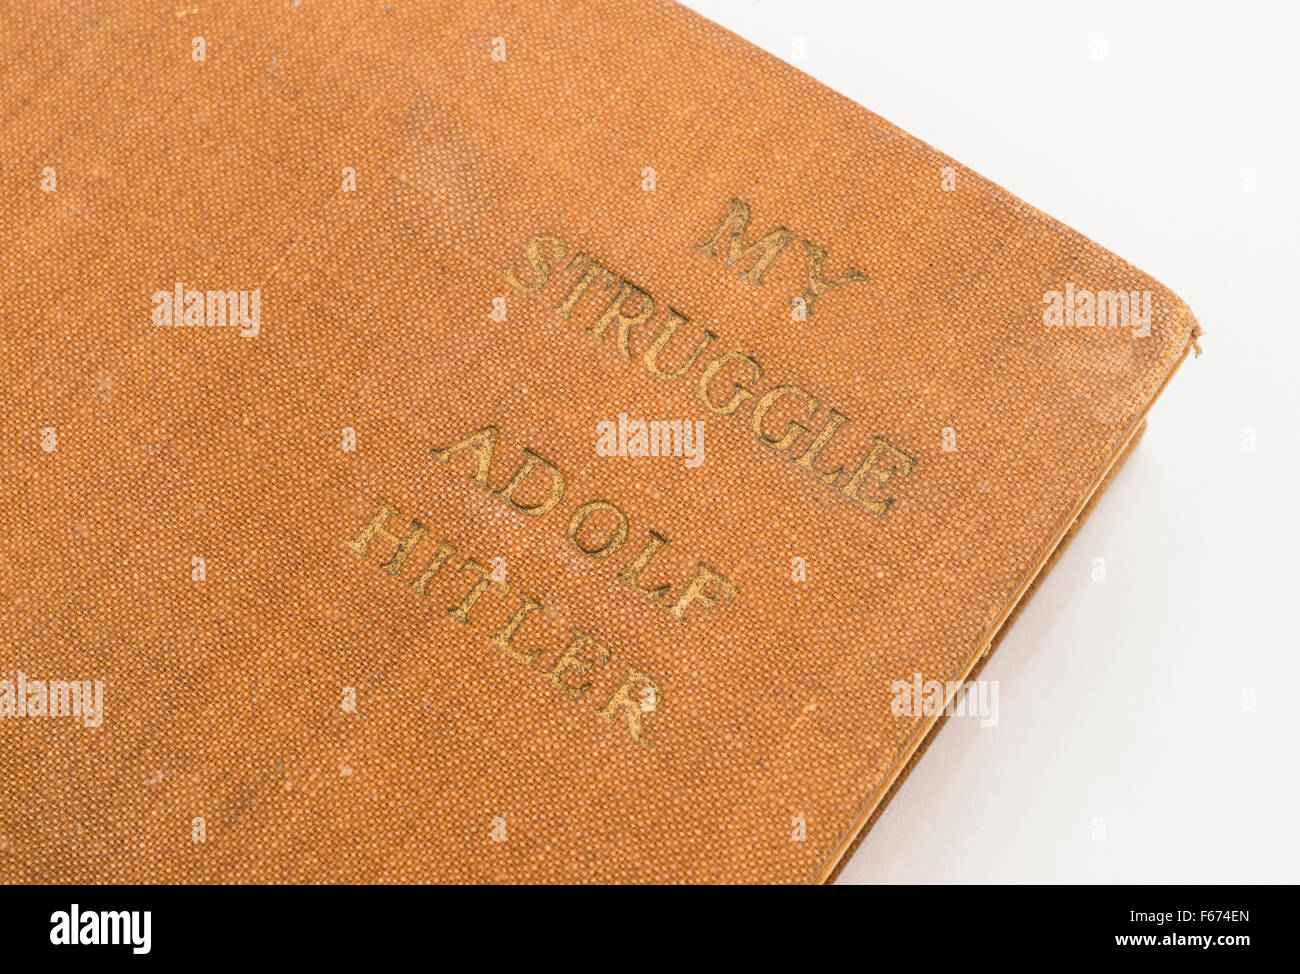 'My Struggle' (Mein Kampf) by Adolf Hitler. - Stock Image